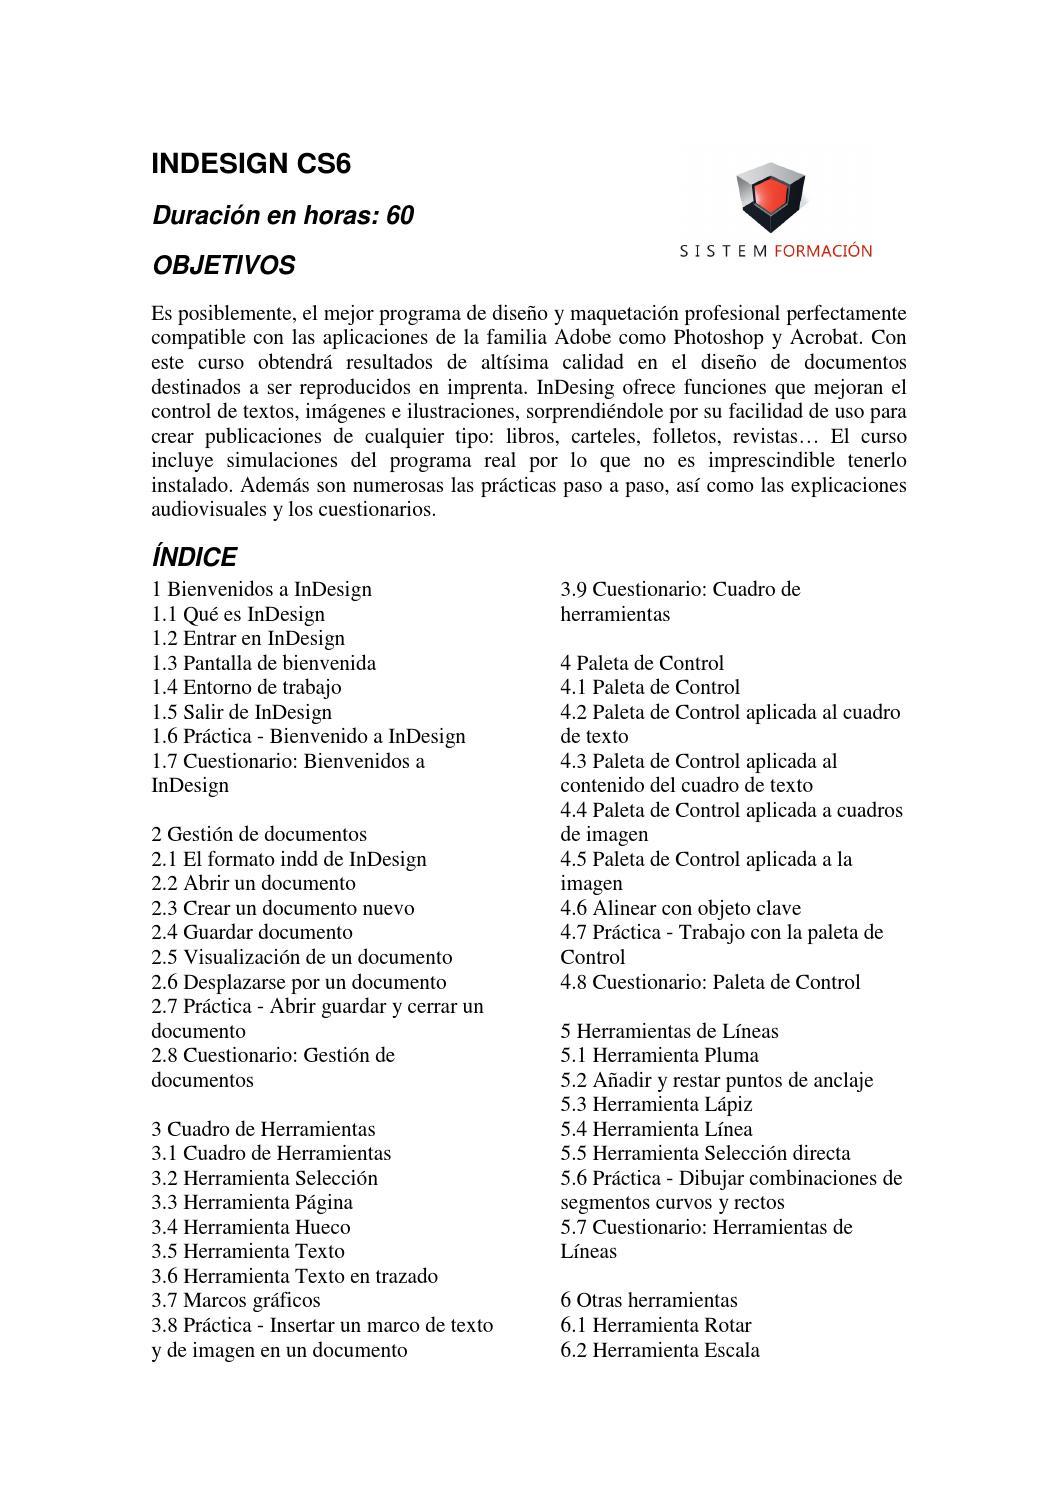 Programa indesign cs6 by Sistem Formacion - issuu